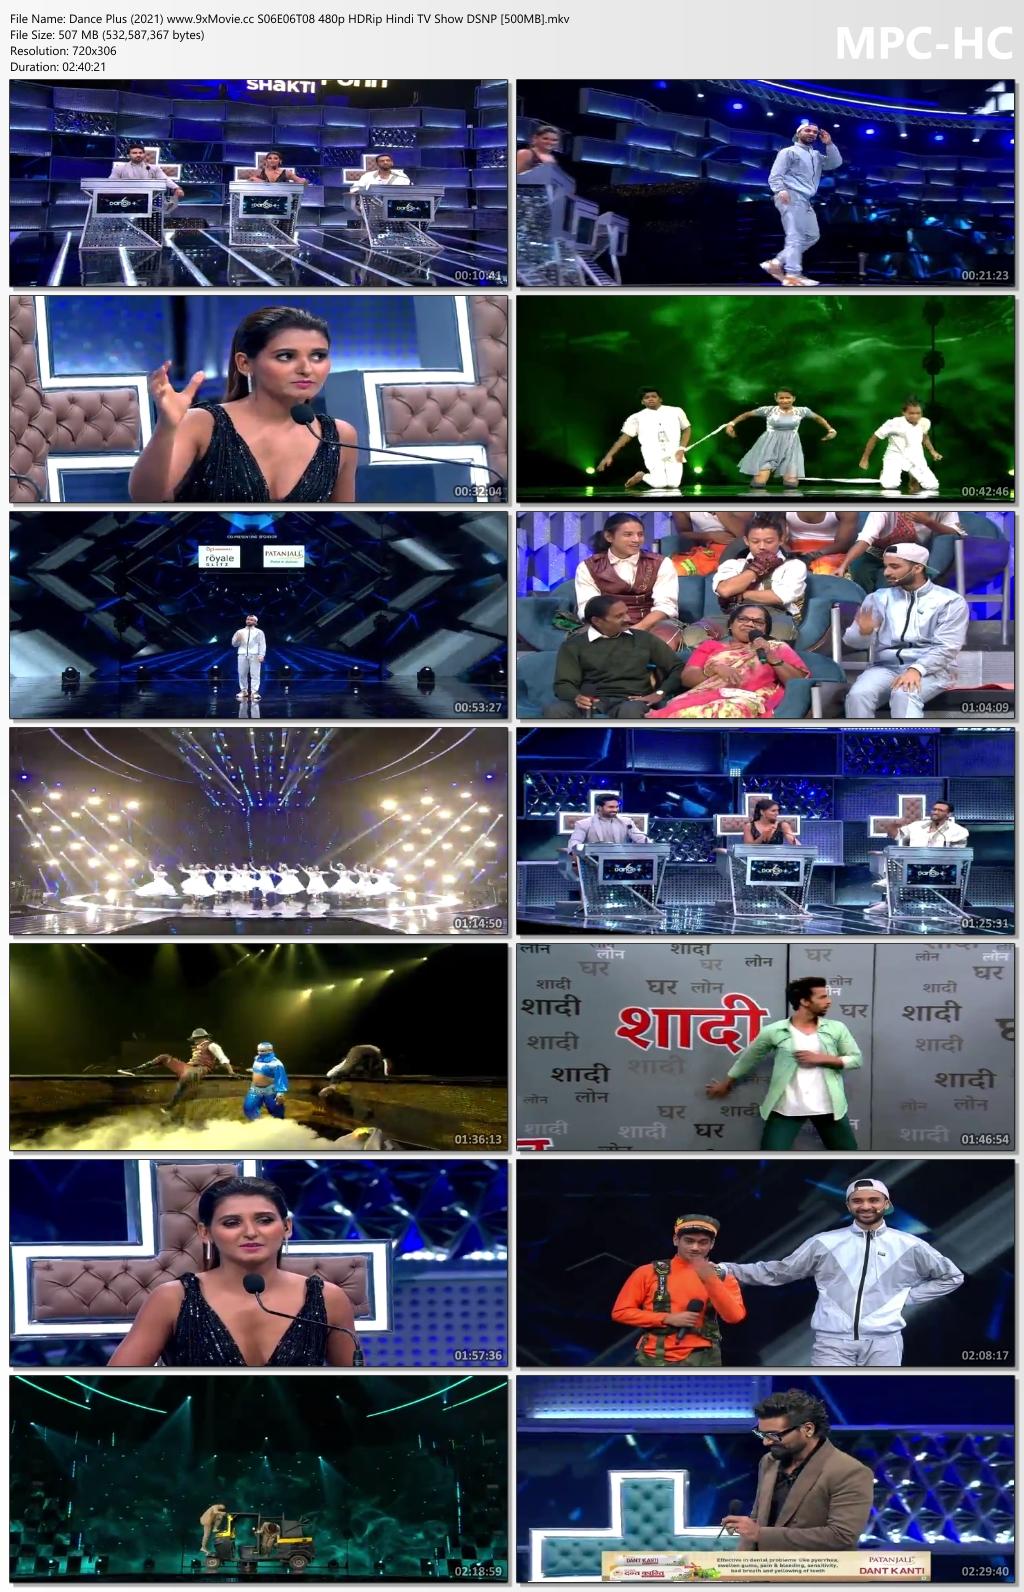 Dance-Plus-2021-www-9x-Movie-cc-S06-E06-T08-480p-HDRip-Hindi-TV-Show-DSNP-500-MB-mkv